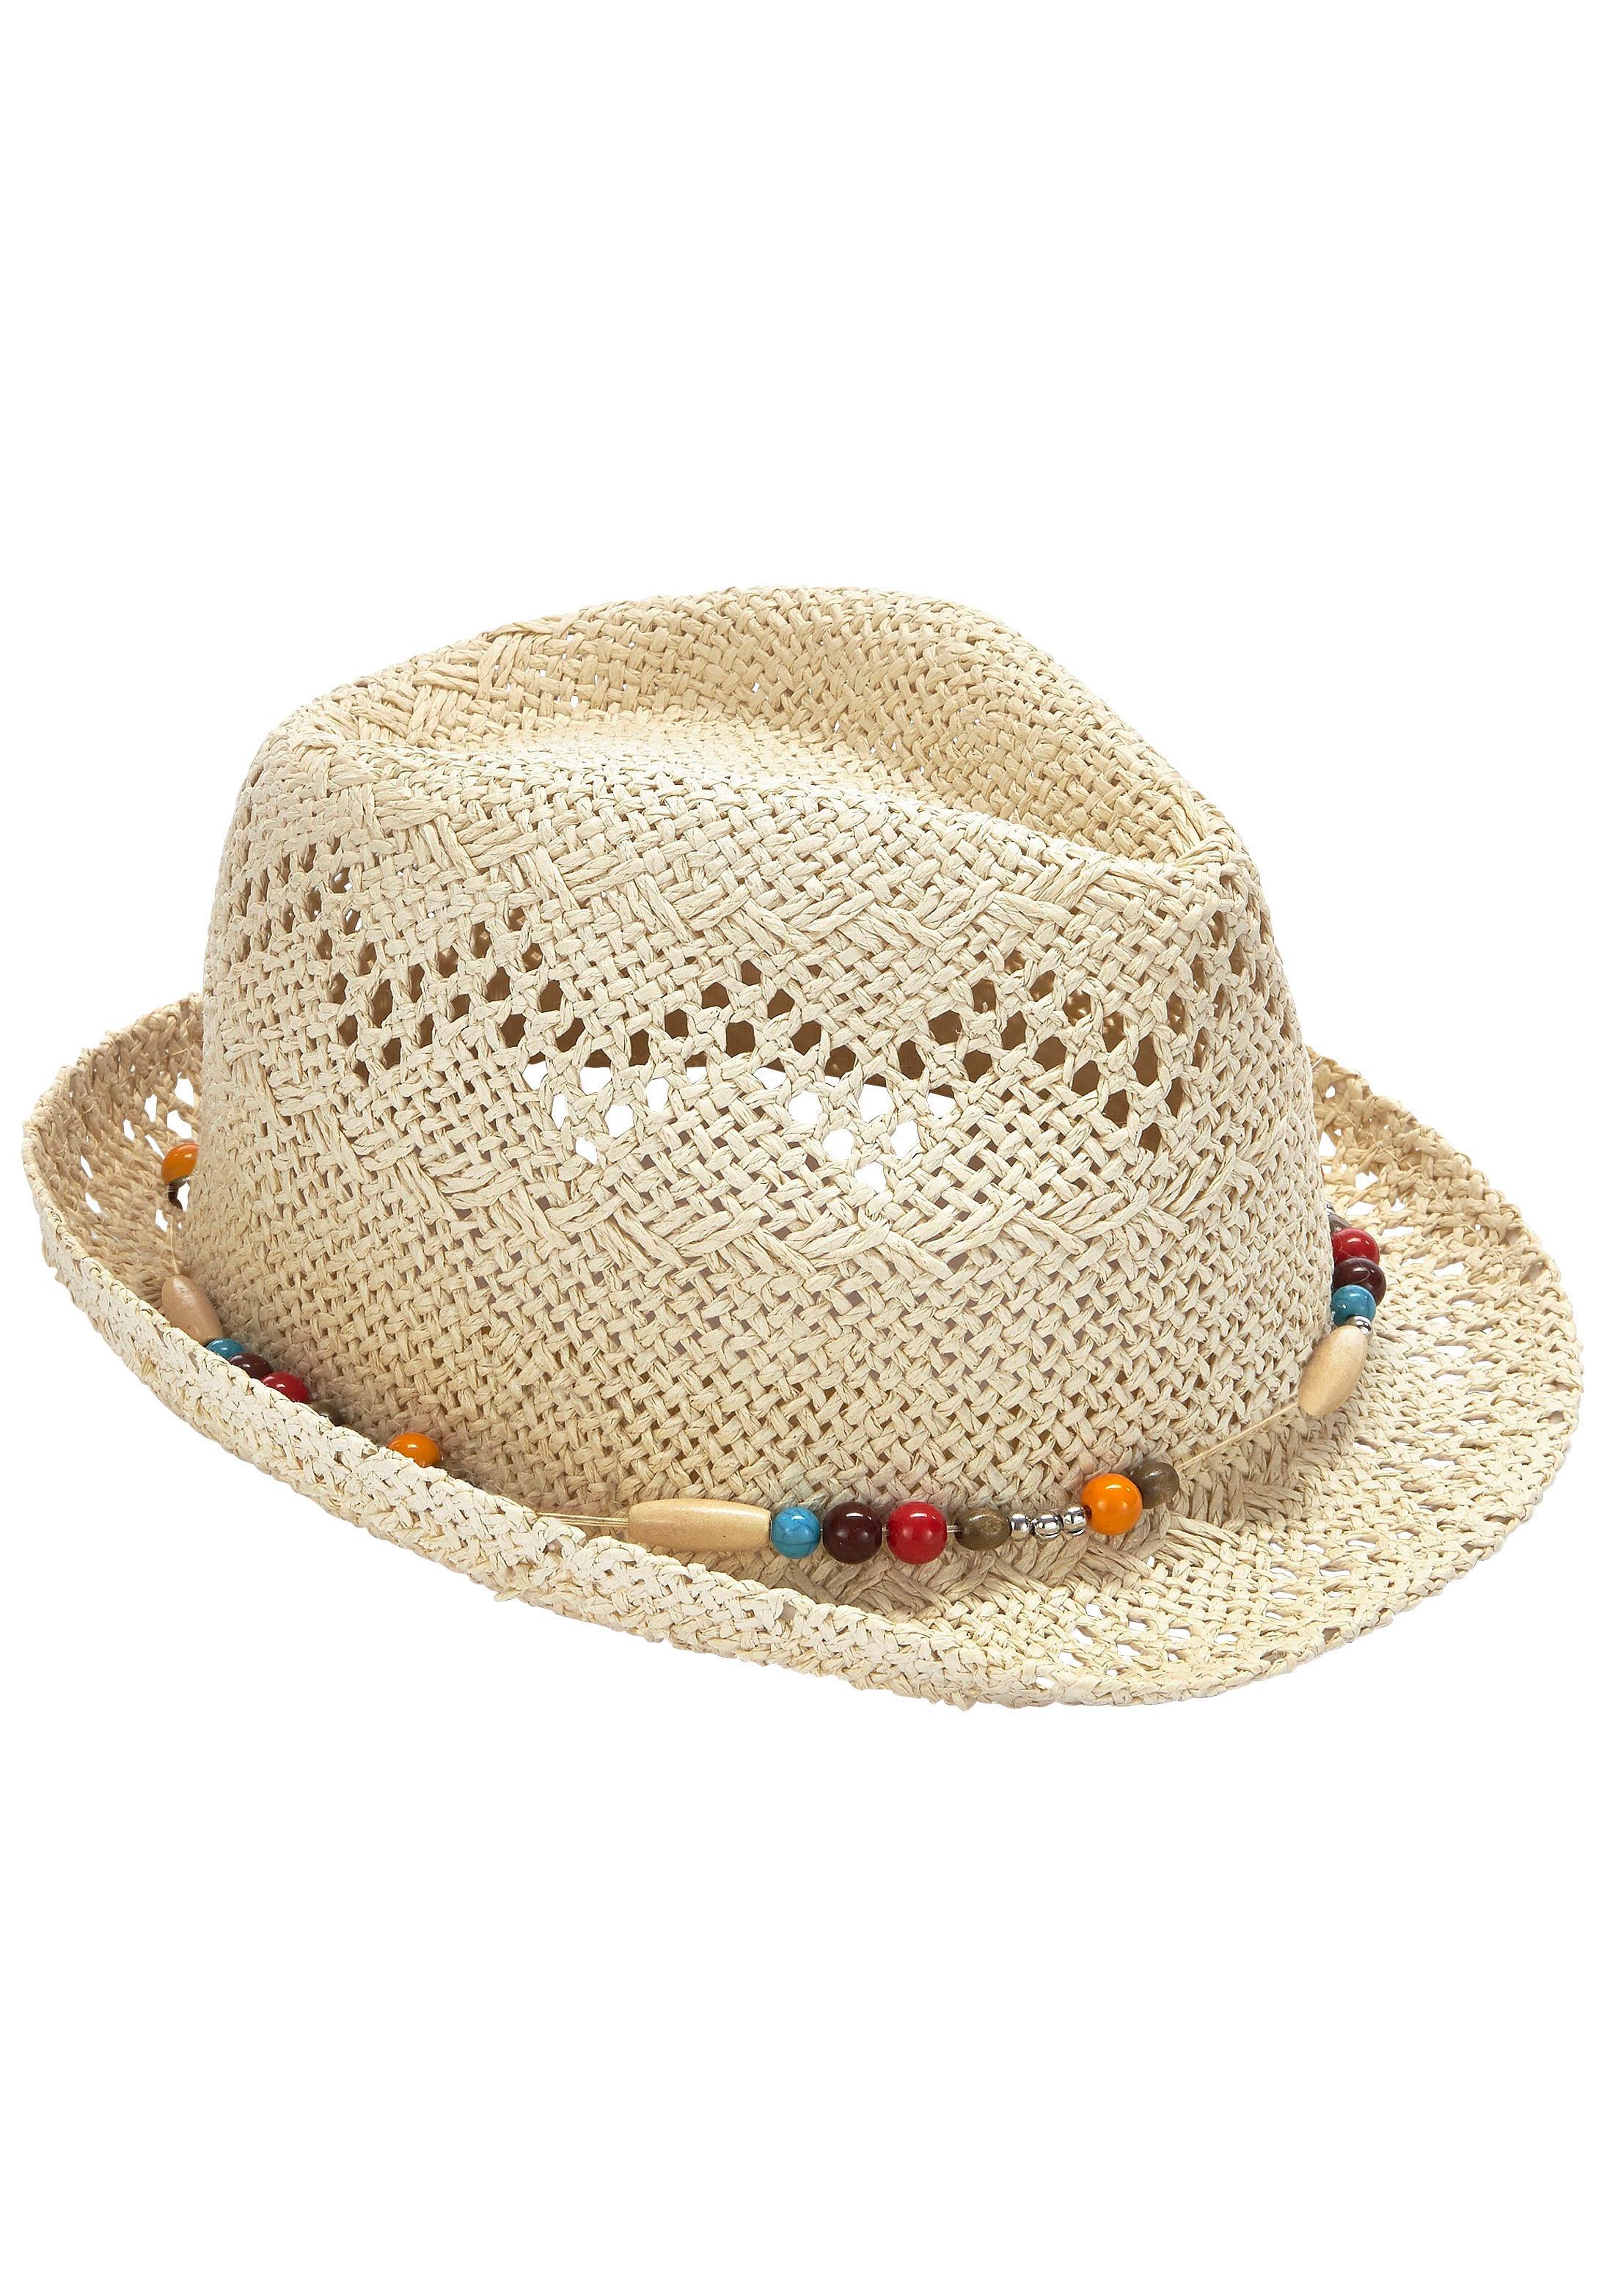 LASCANA Strohhut | Accessoires > Hüte | Weiß | Lascana